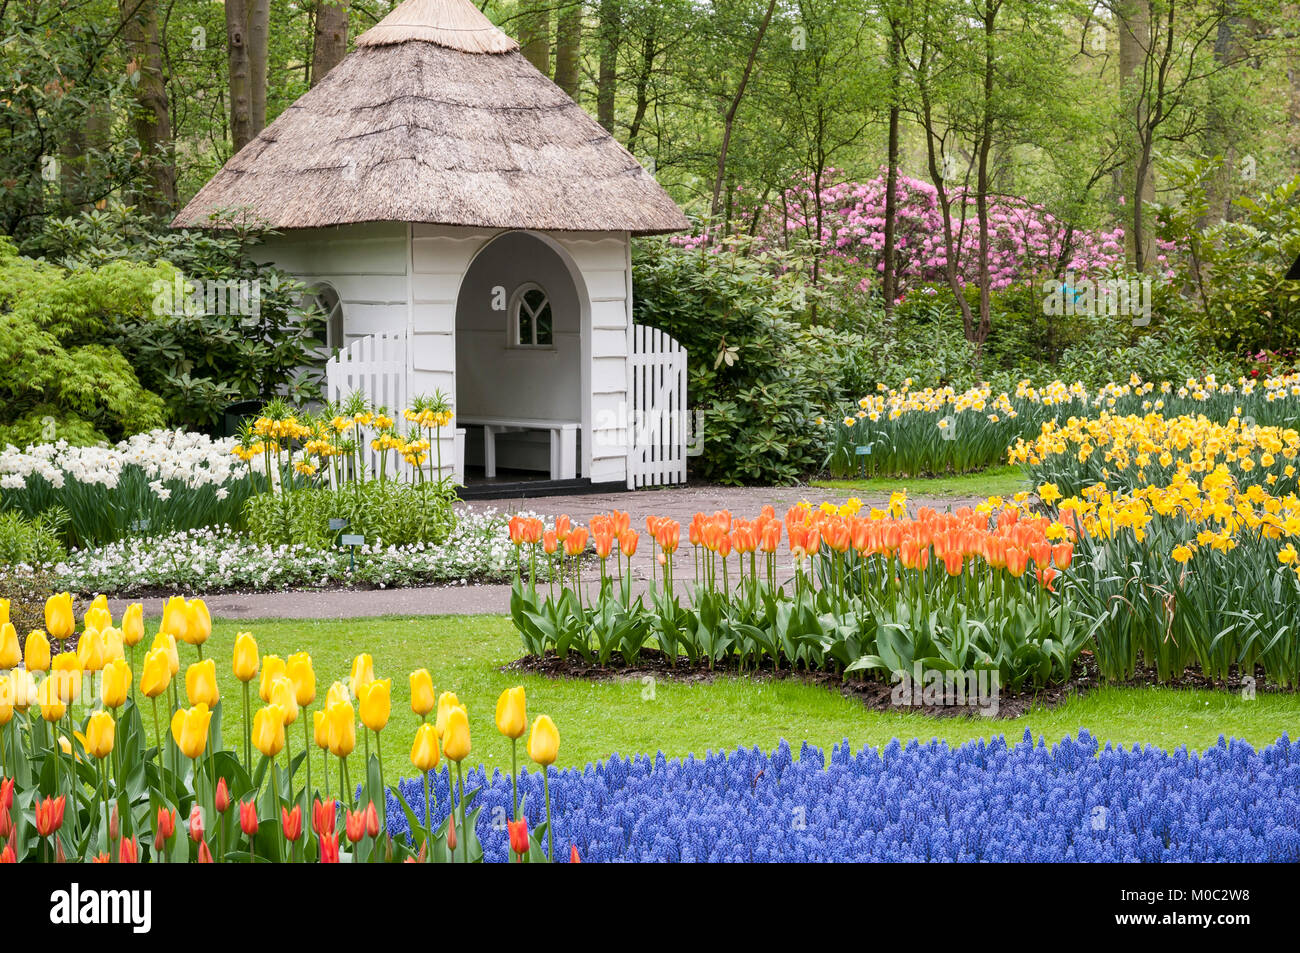 Keukenhof, Lisse, Niederlande - Stock Image